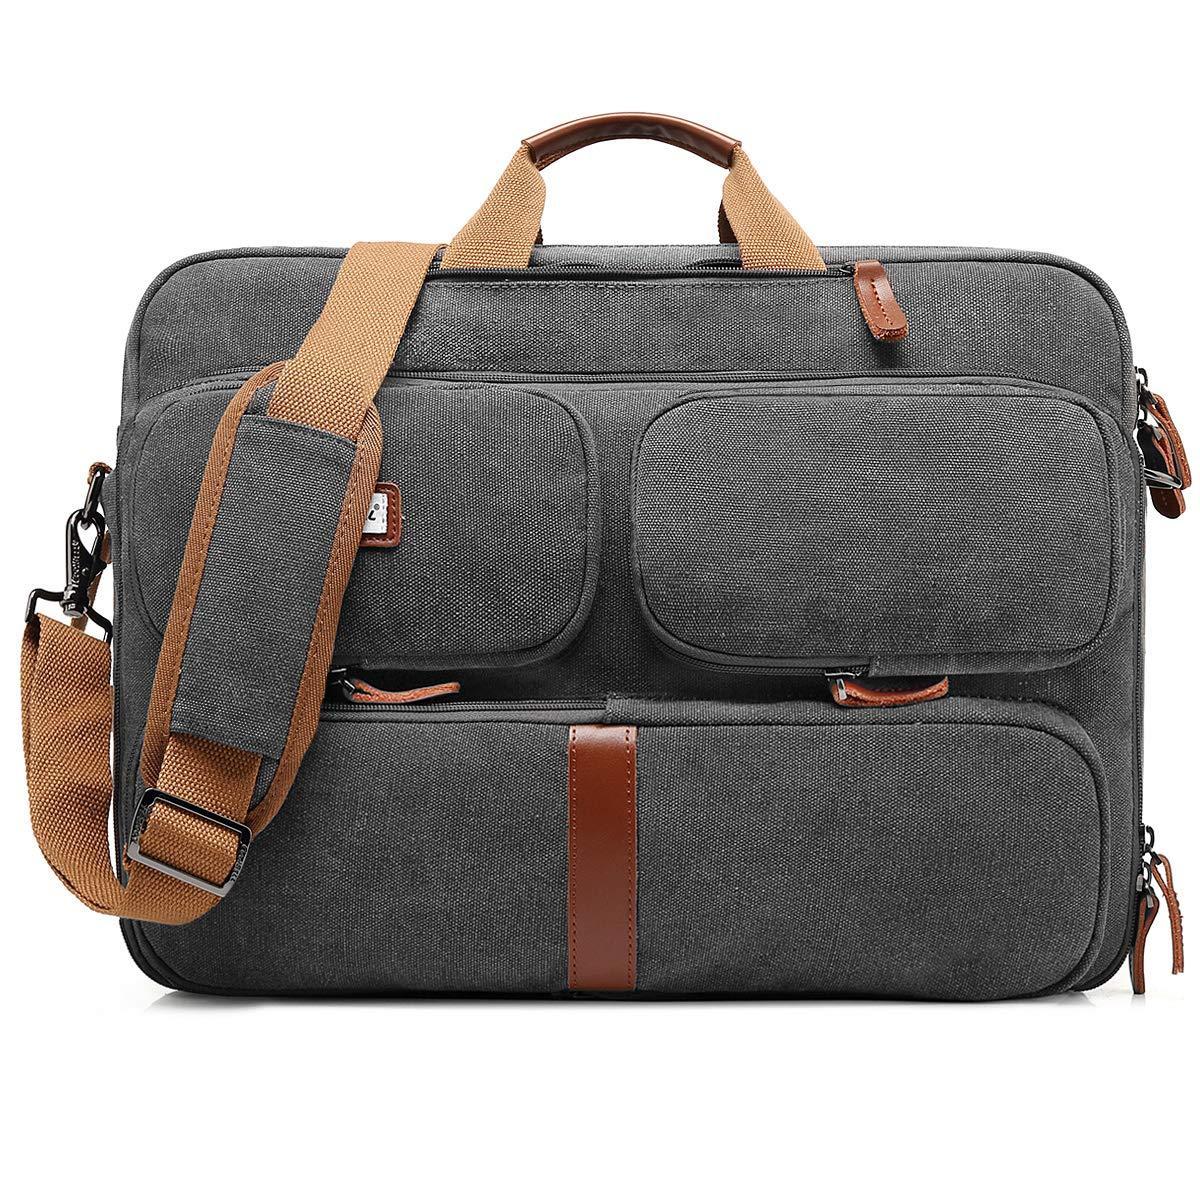 CoolBELL Convertible Laptop Bag Backpack Messenger Bag Shoulder Bag Business Briefcase Multi-Functional Travel Rucksack 17.3 Inches Laptop Case for Men/Women (Canvas Dark Grey)